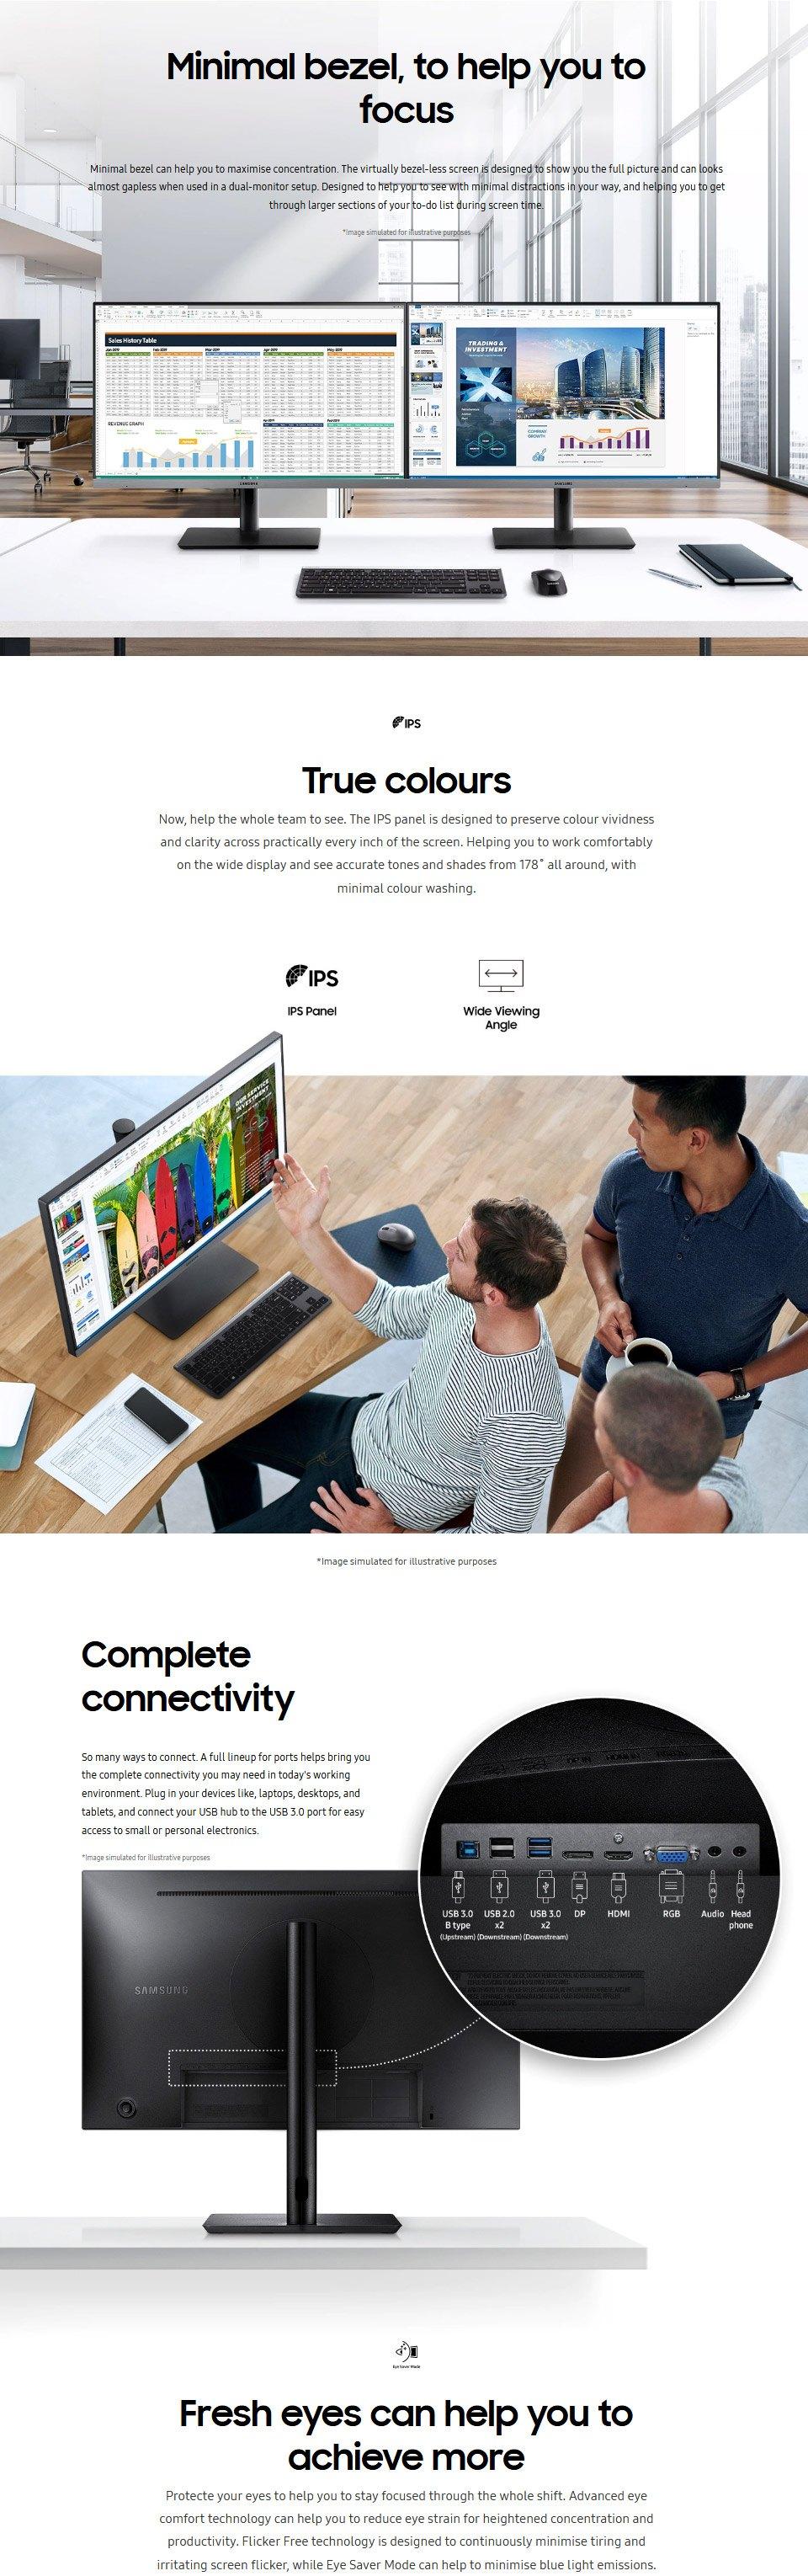 Samsung R650 FHD 75hz IPS 27in Monitor features